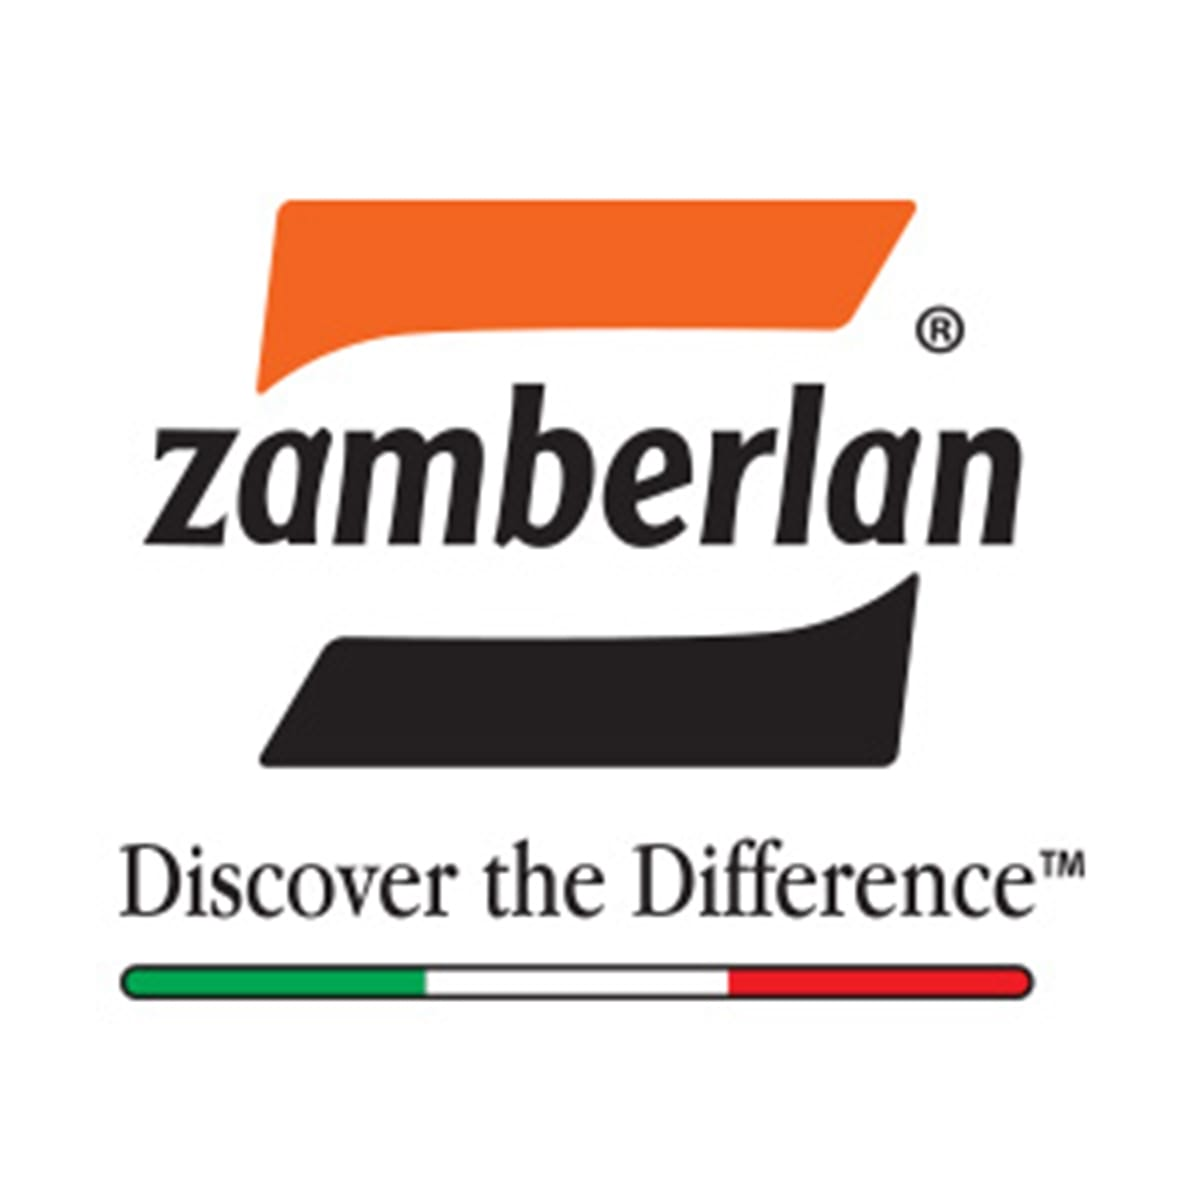 d75ca58747c Zamberlan - Discounts for Military & Gov't | GovX